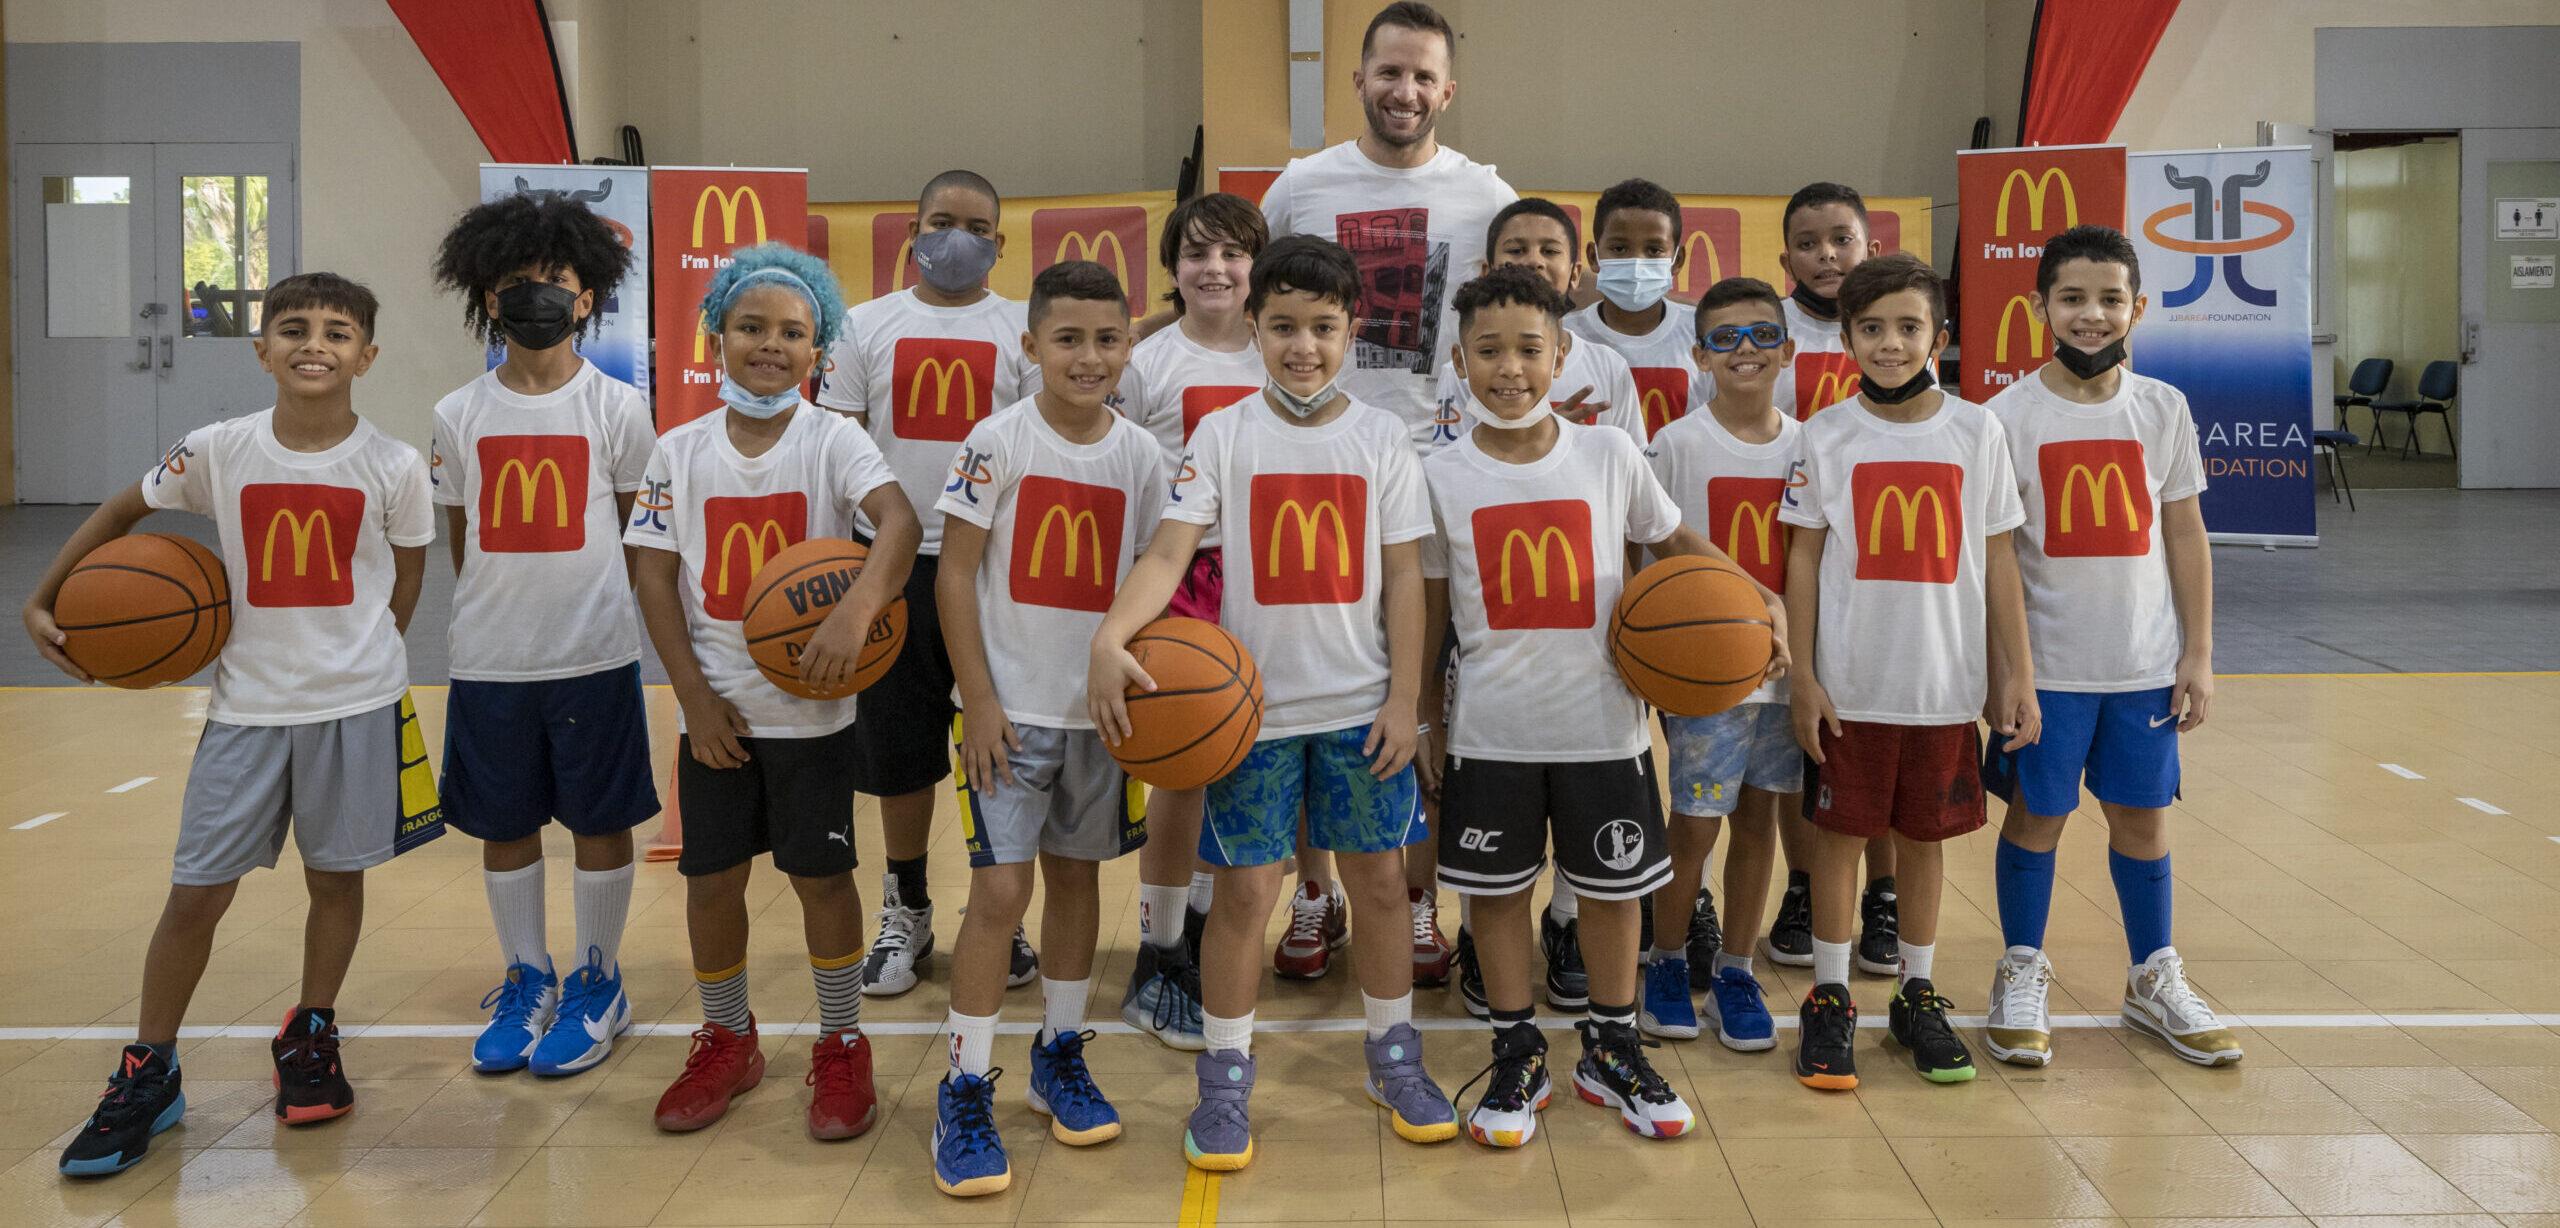 [Puerto Rico] McDonald's se une a JJ Barea Foundation para apoyar el deporte infantil